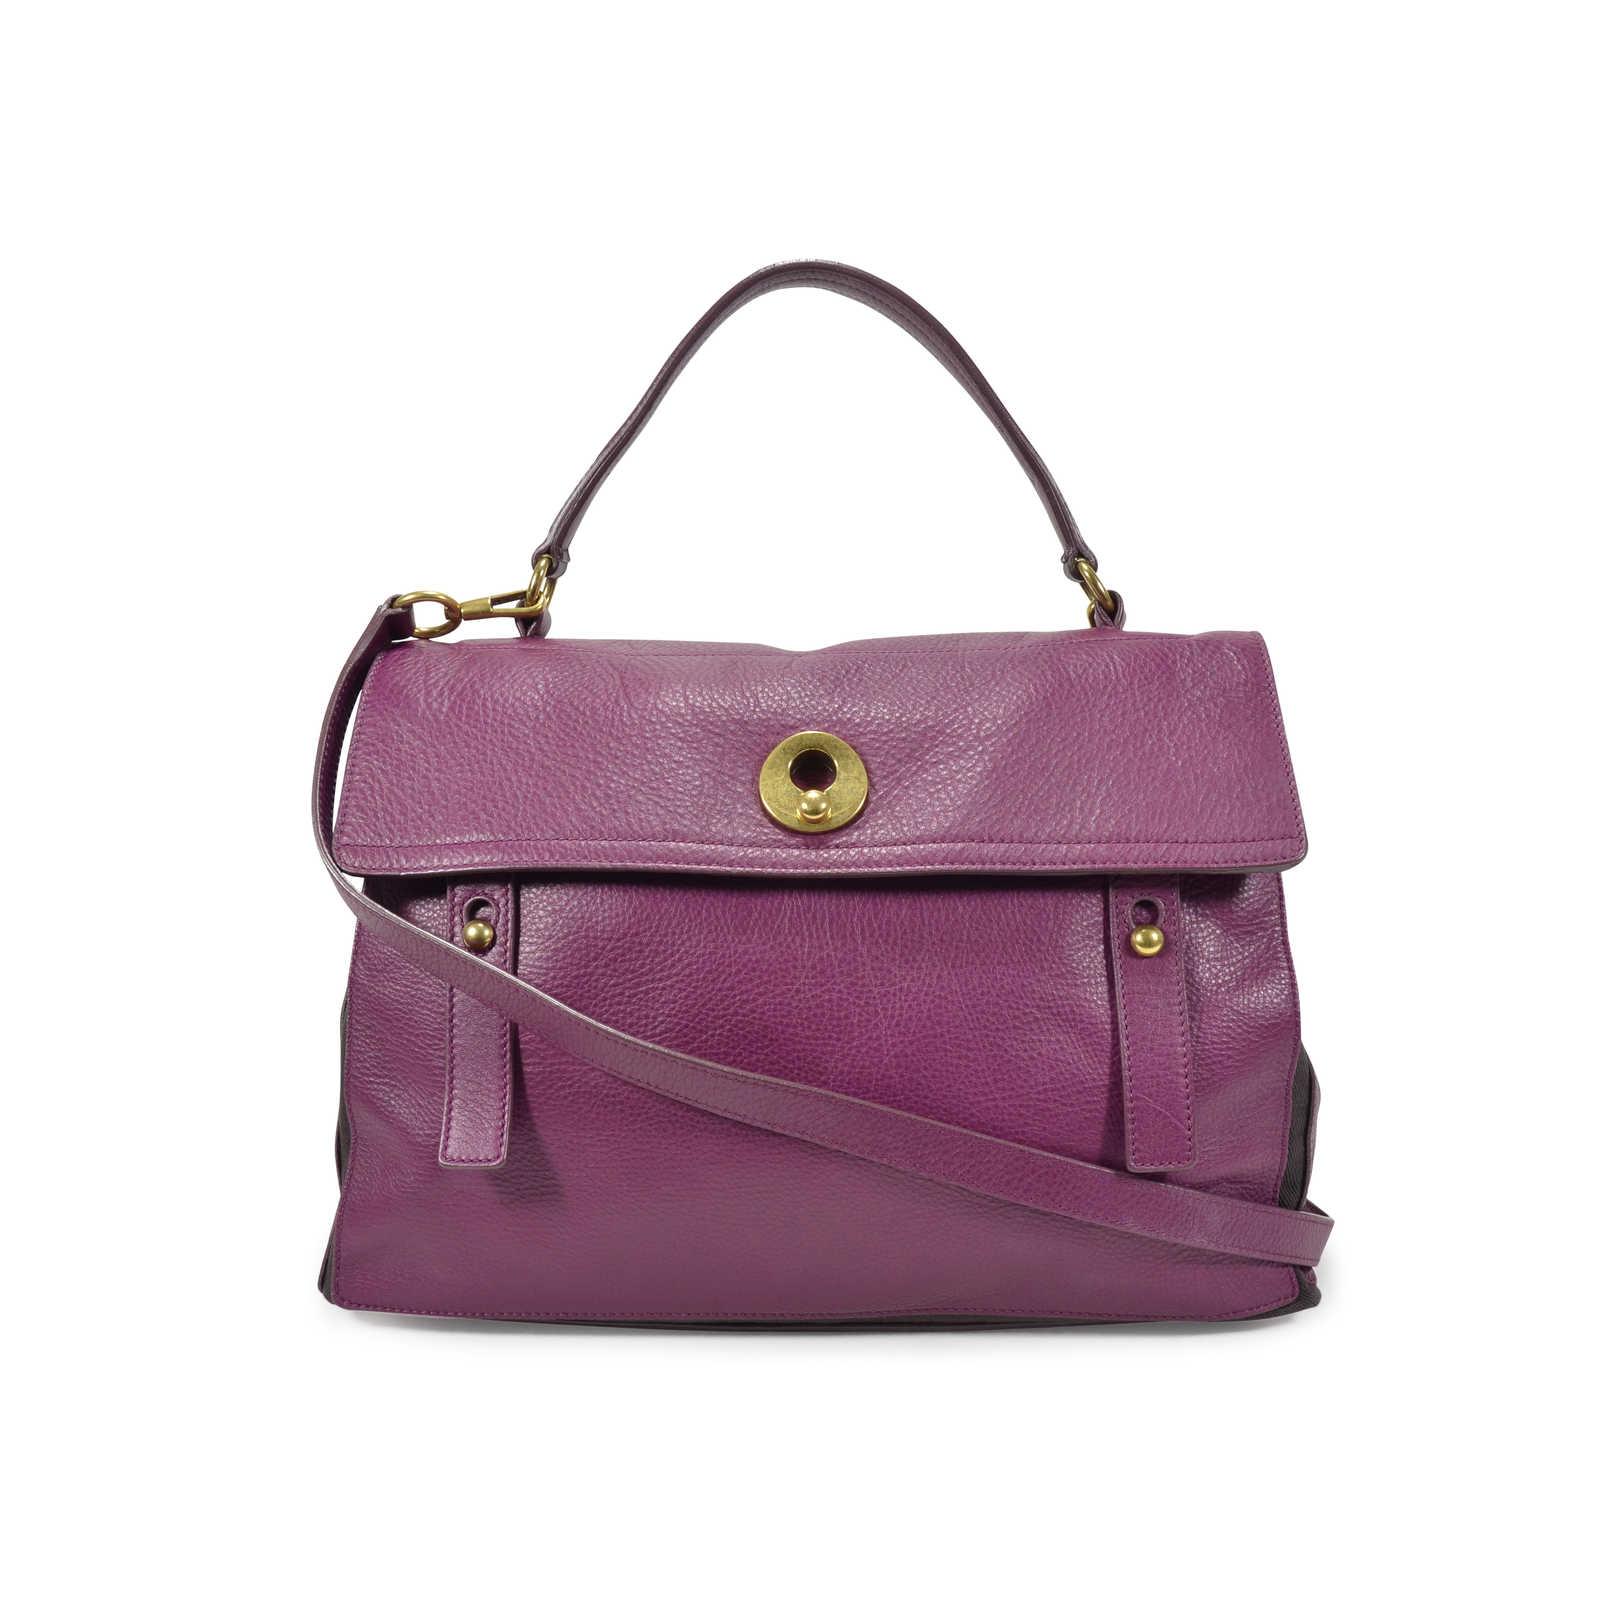 9079c70809 Authentic Second Hand Yves Saint Laurent Borsa Muse Two Bag (PSS-350-00019  ...